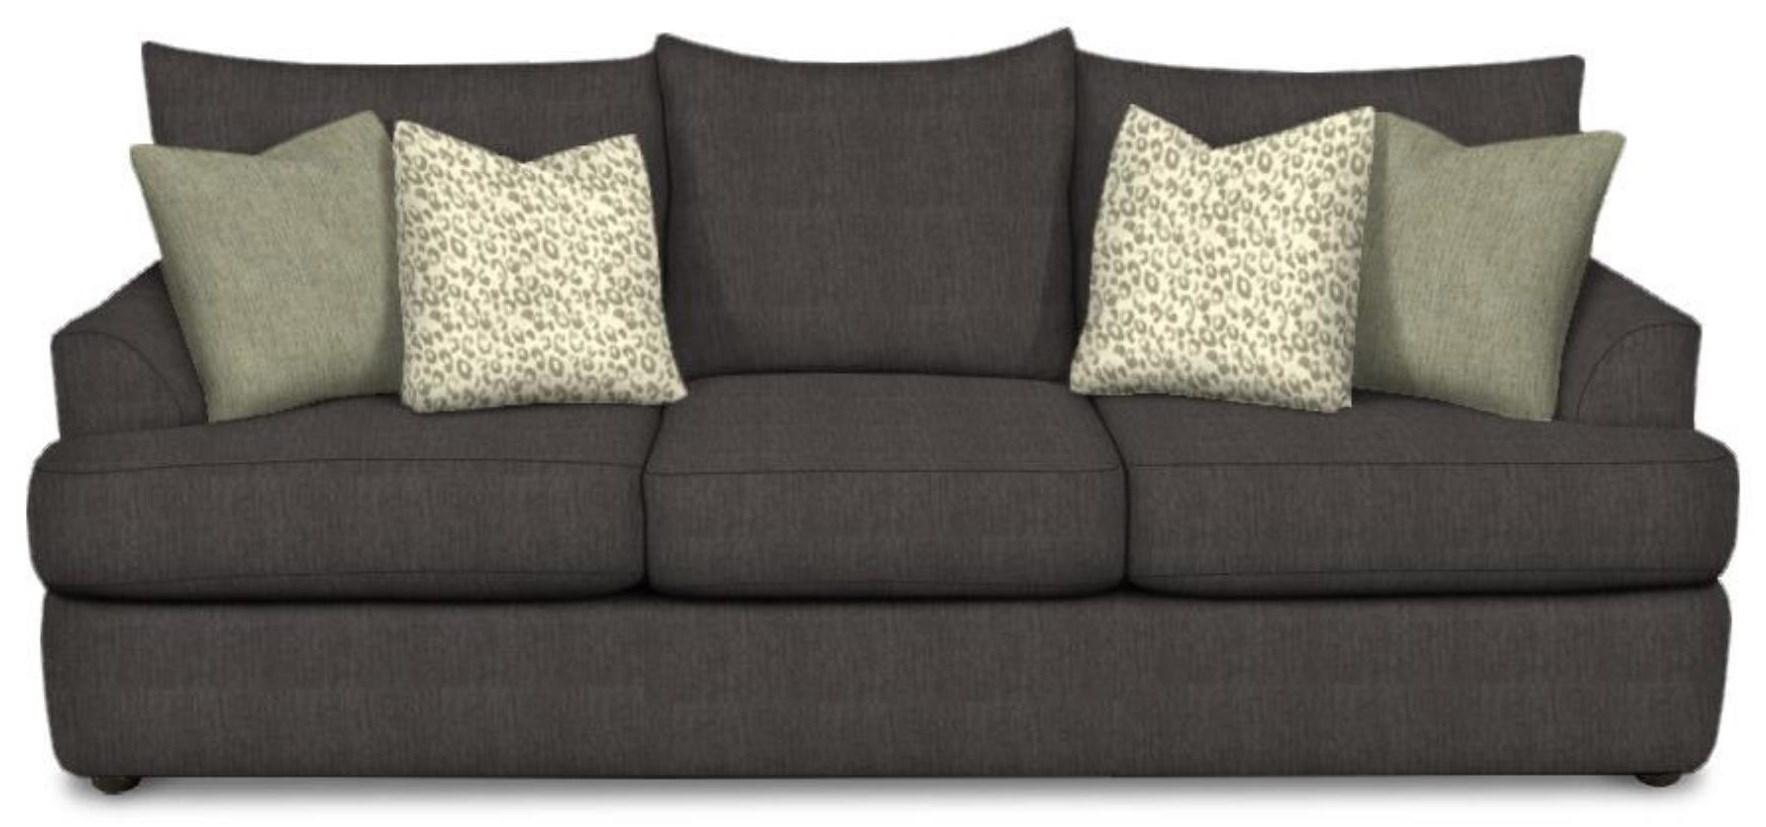 Freya Stationary Sofa by Metropia at Ruby Gordon Home